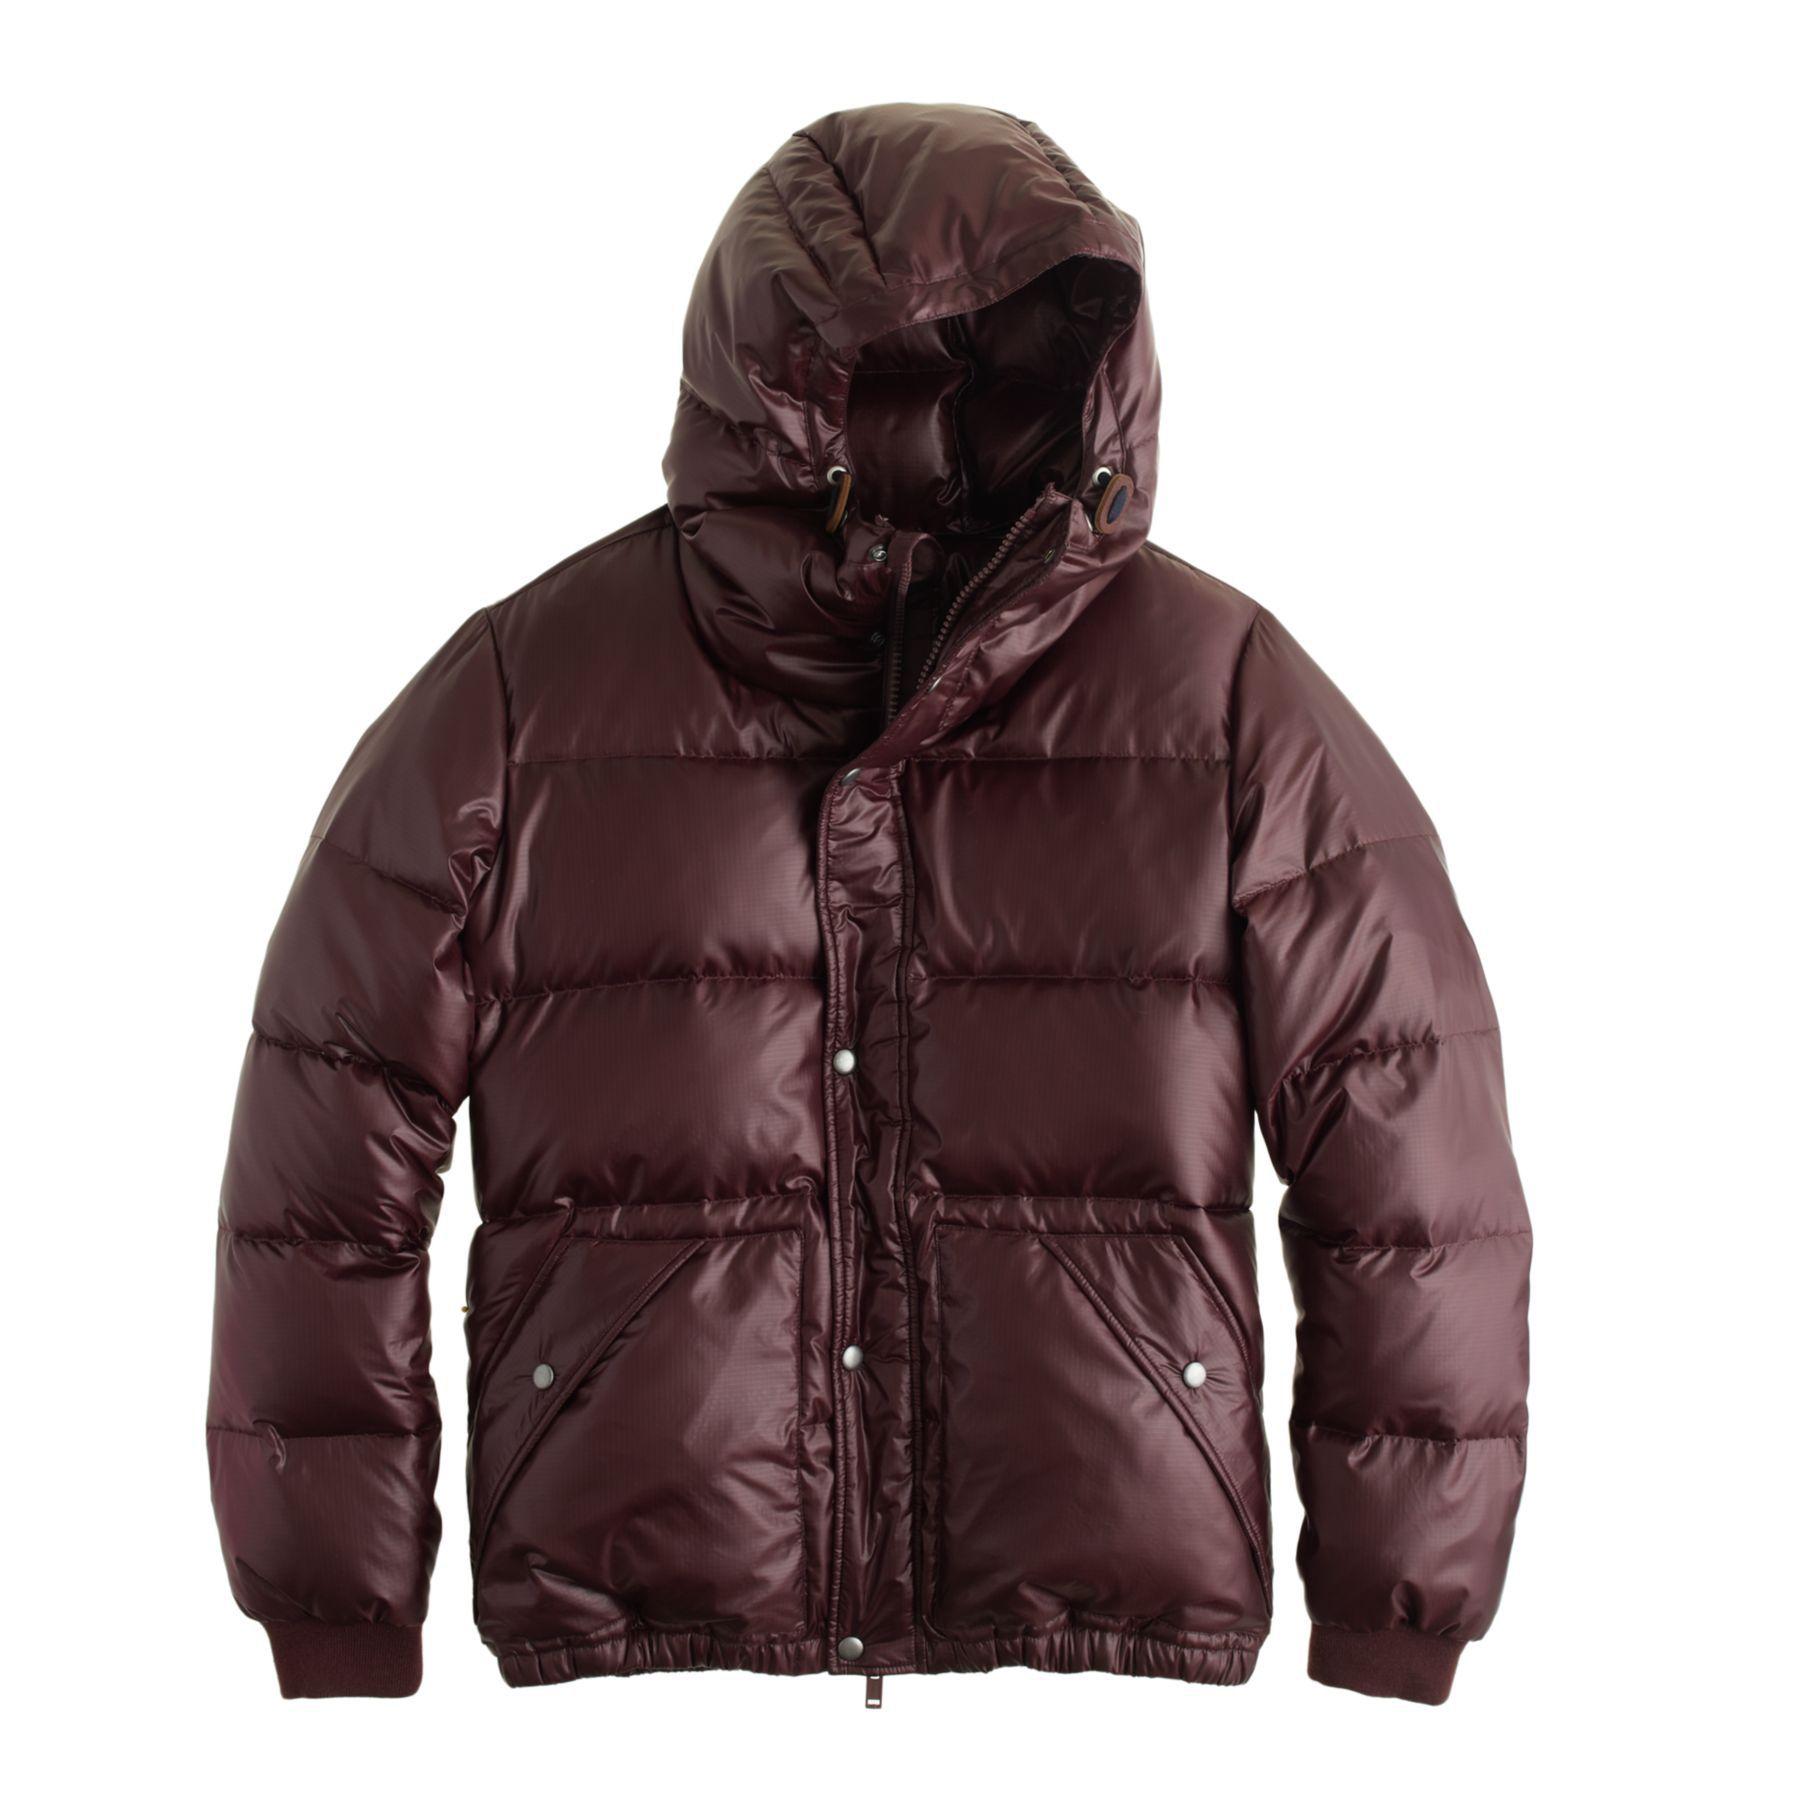 J.Crew men's hooded puffer jacket in vintage merlot